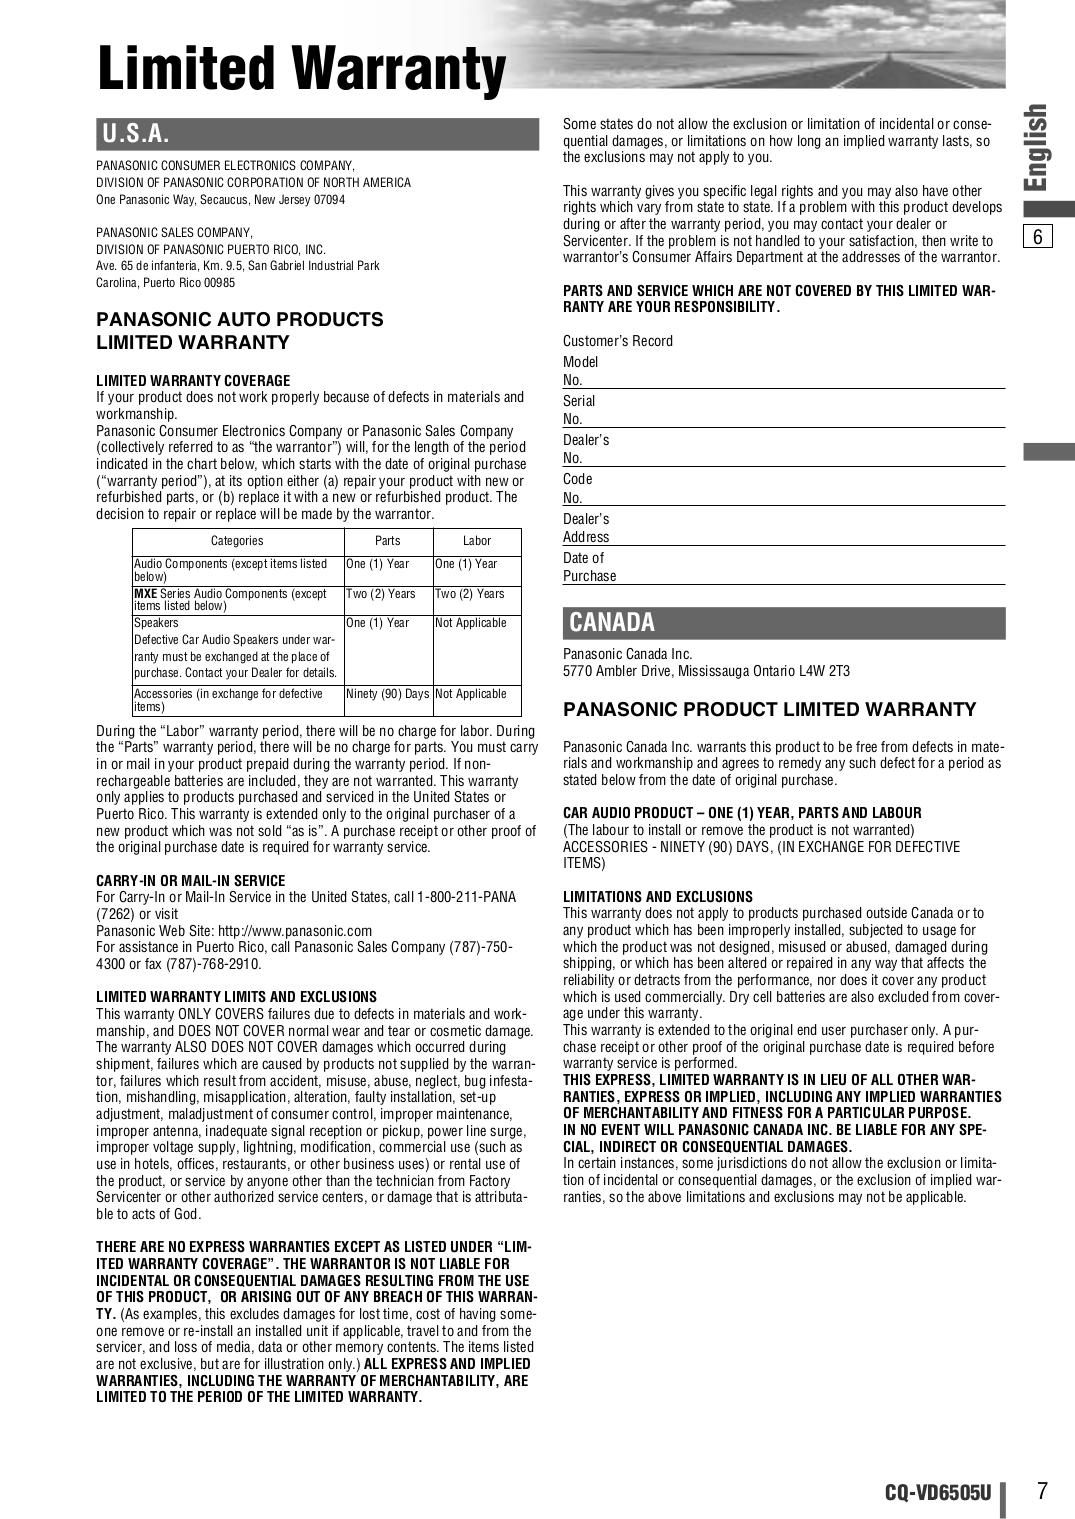 PDF manual for Panasonic Car Video CQ-VD6505U